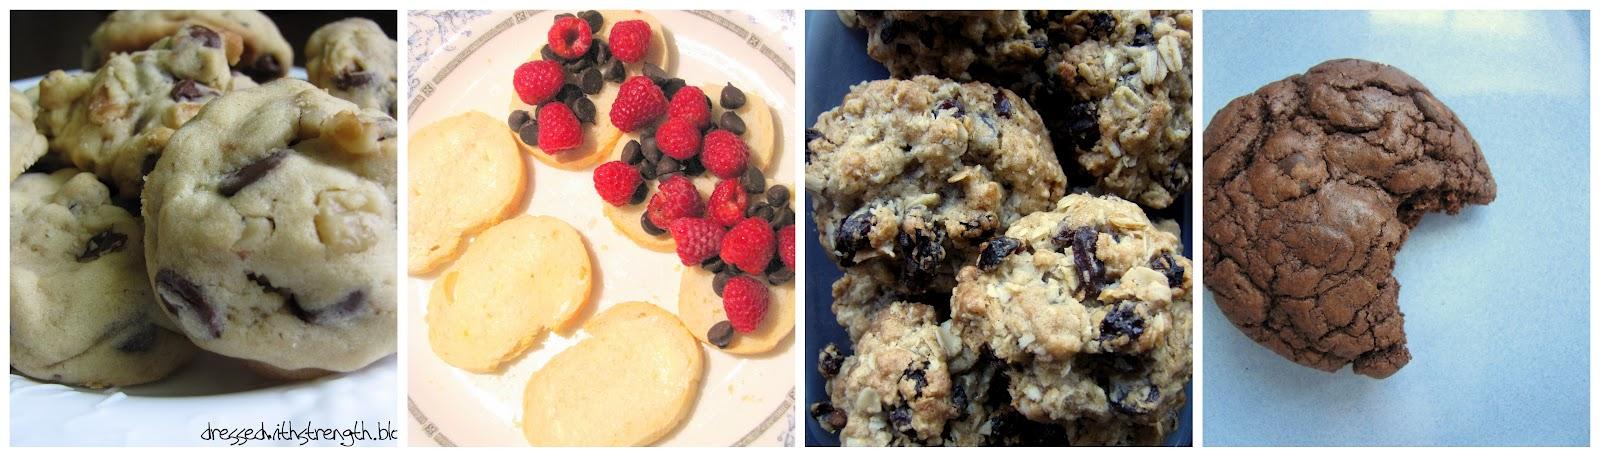 ... raspberry chocolate panini :: Aunt Lona's oatmeal :: ATK triple